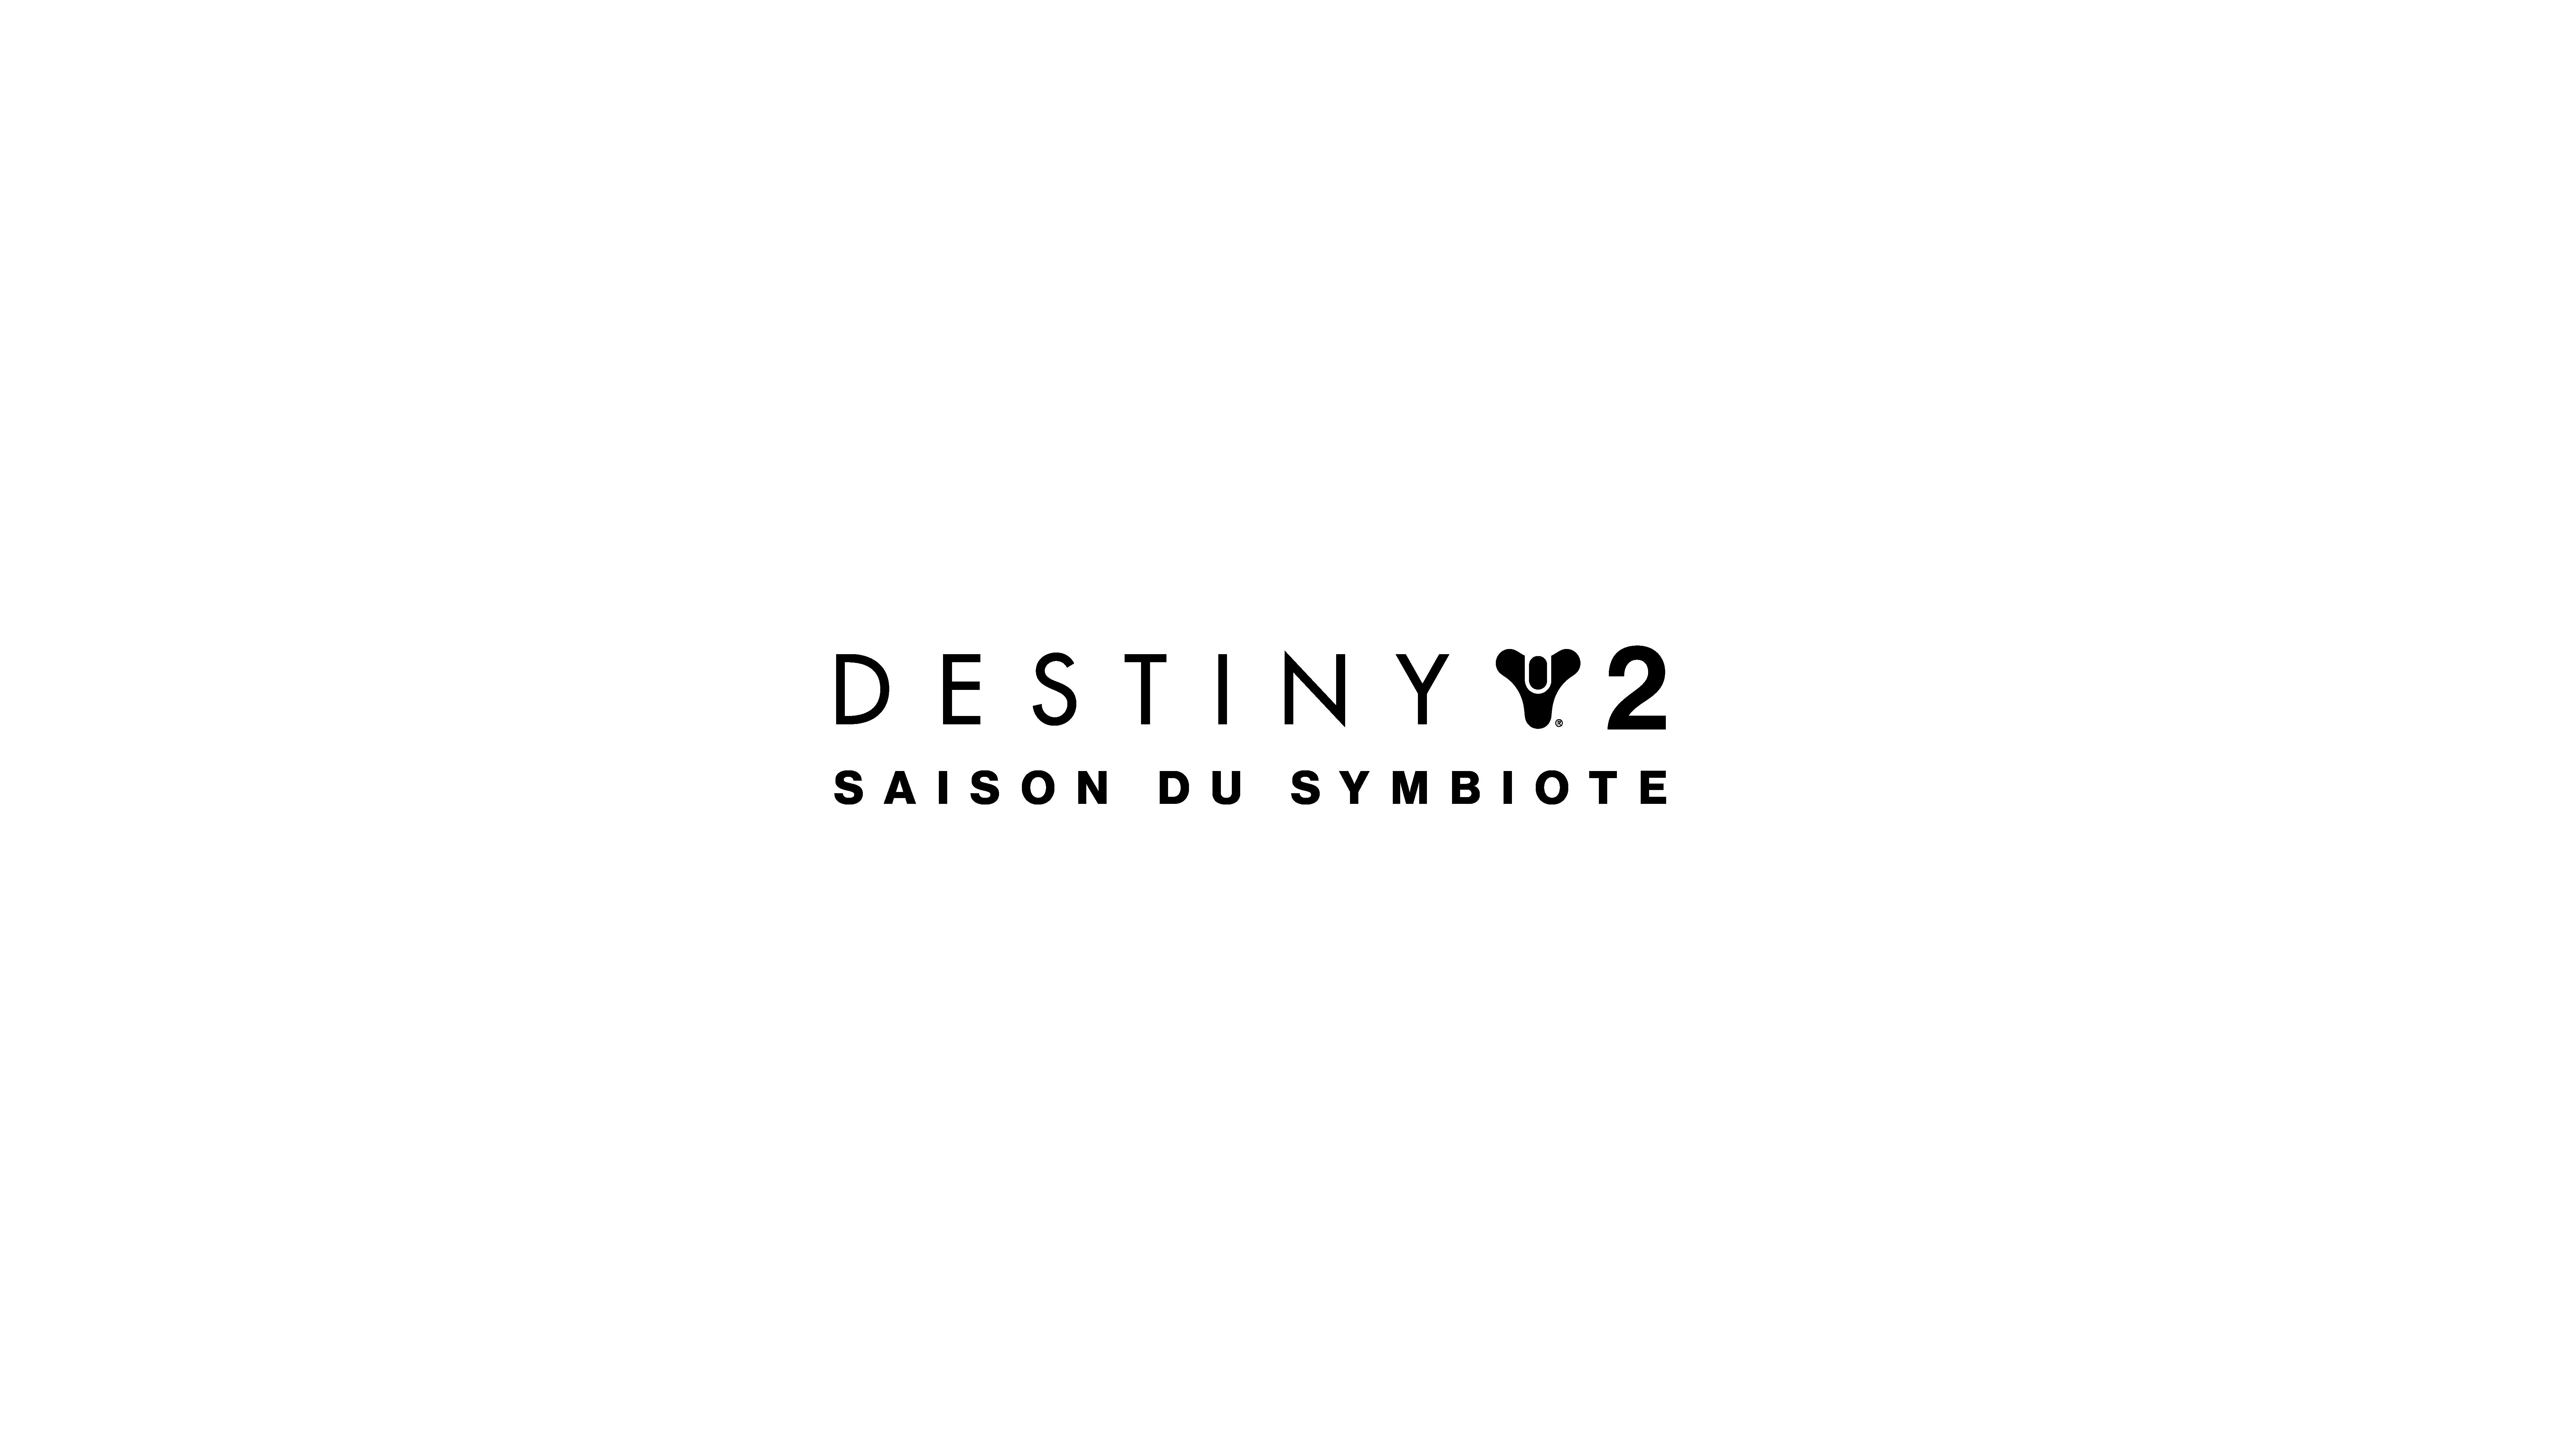 lp_season_of_the_splicer_logo_LOCs_FR